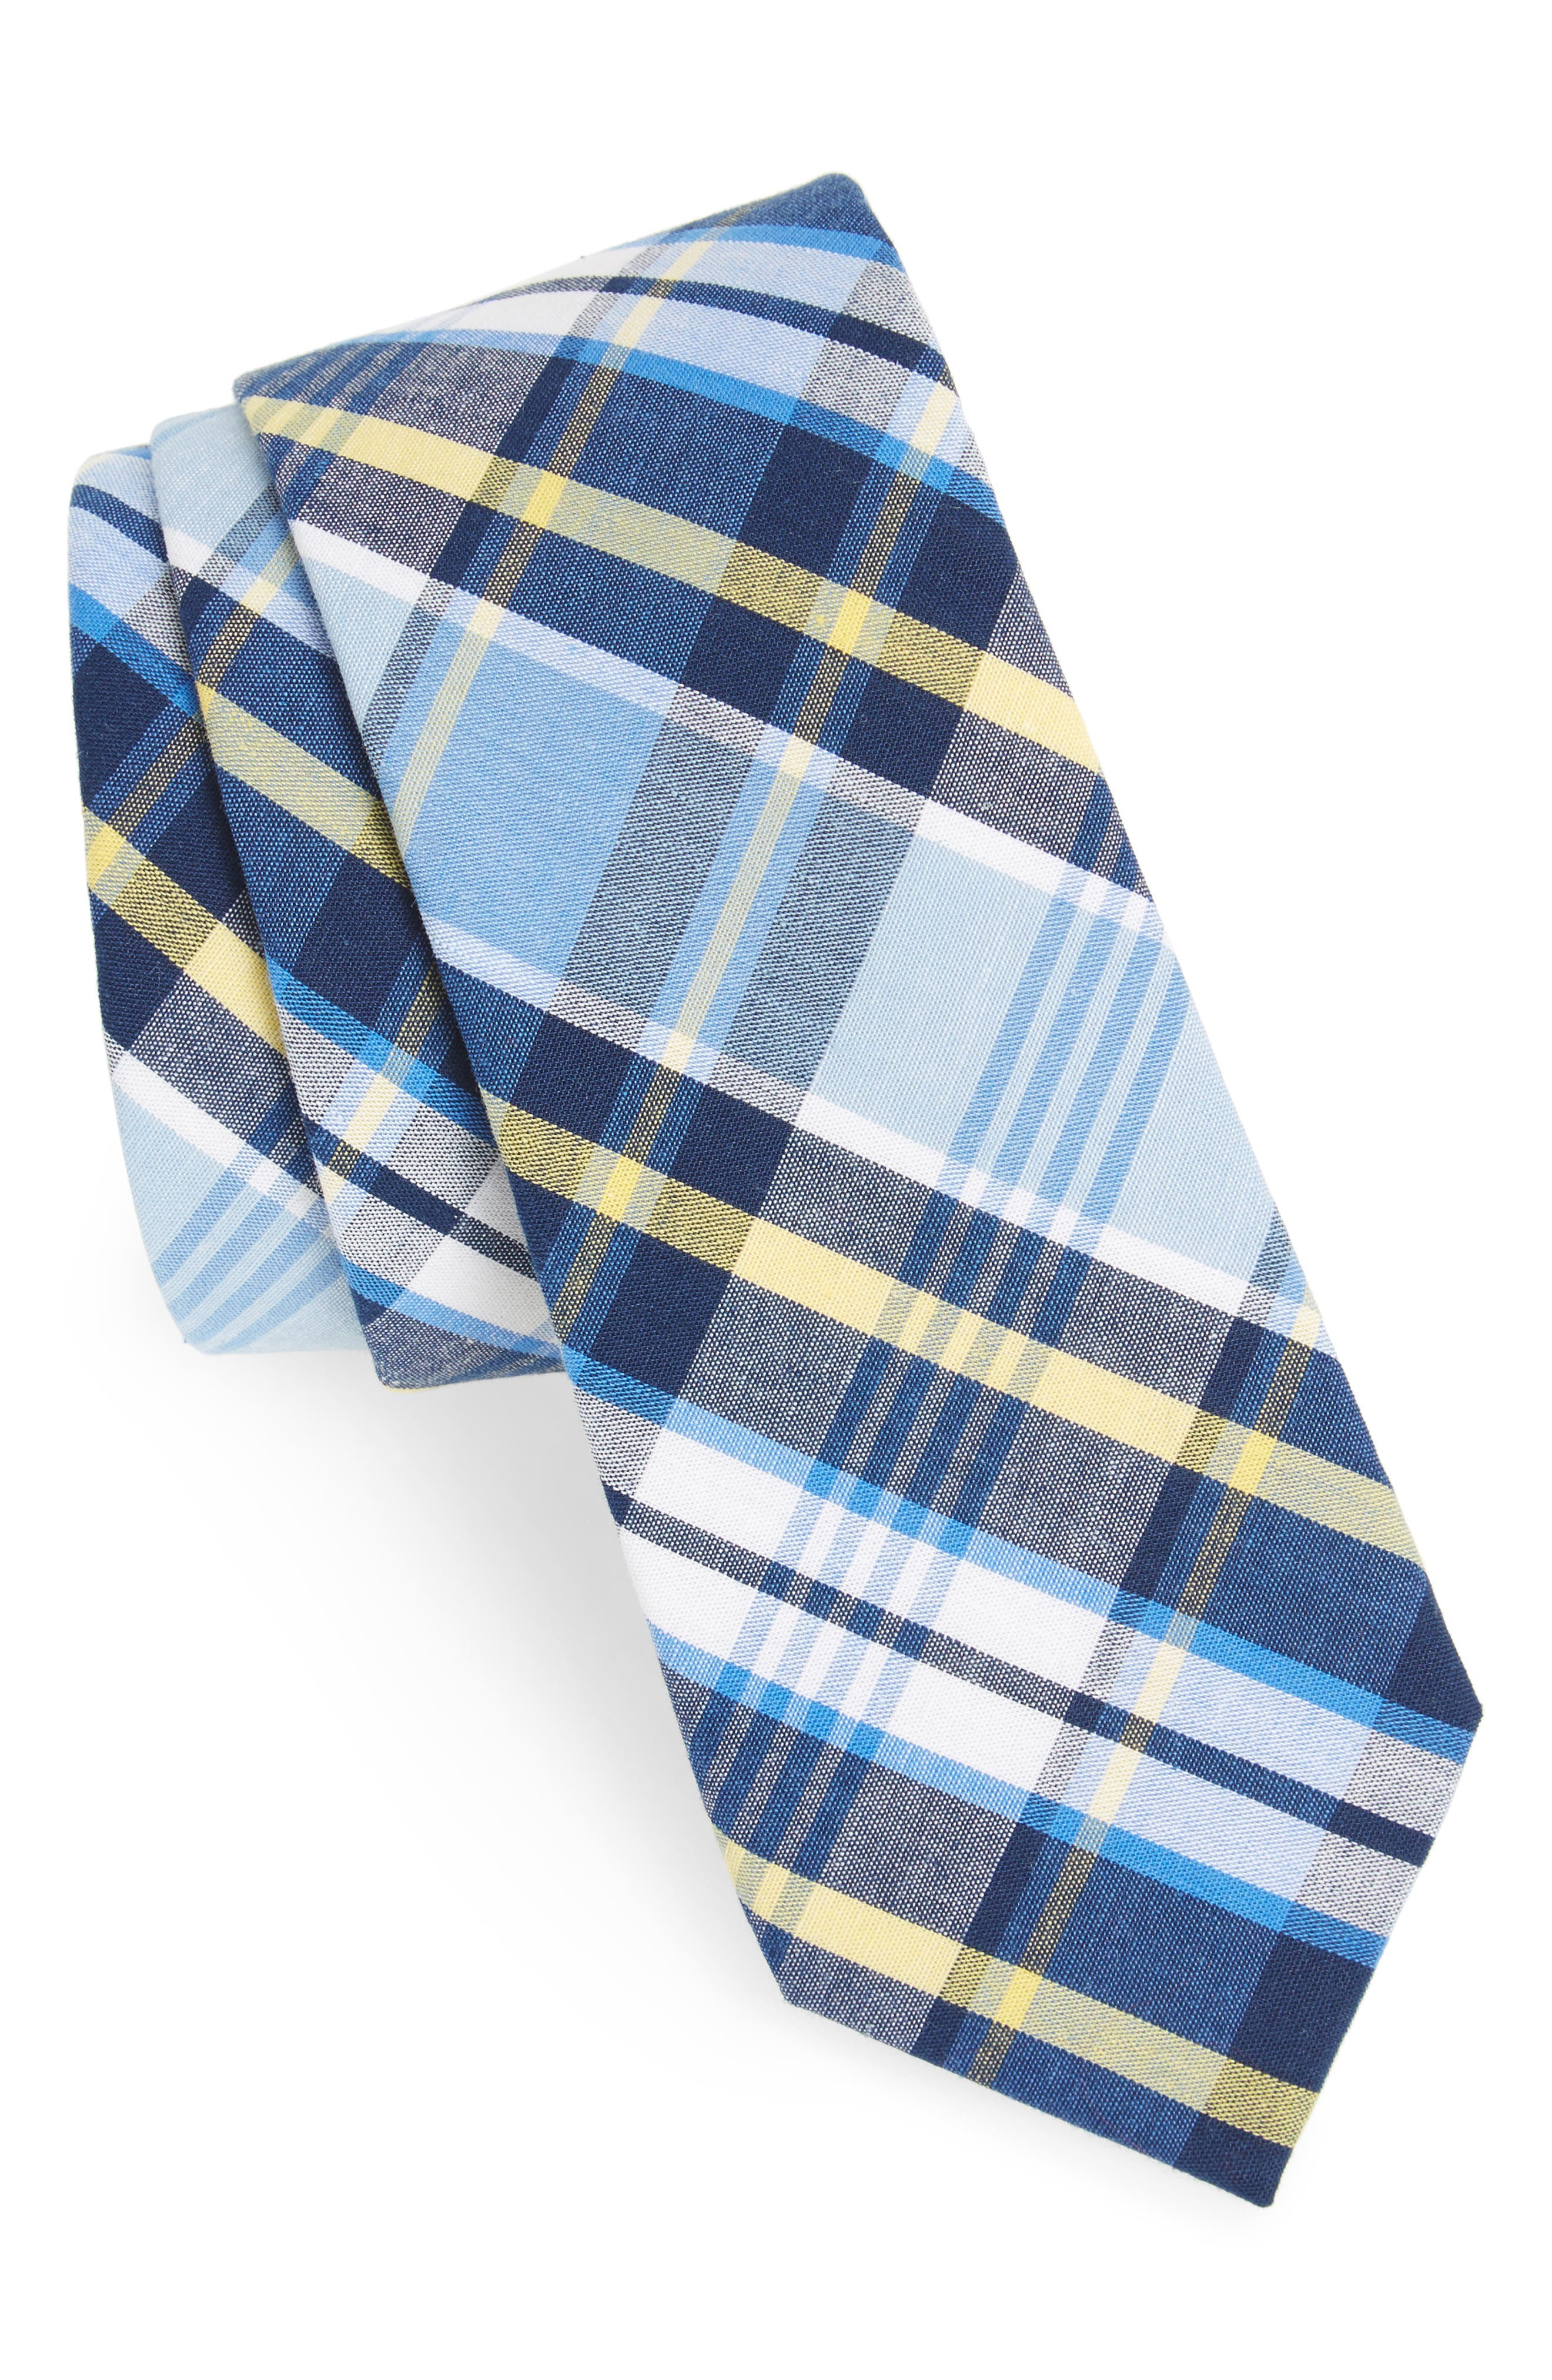 Sean Plaid Cotton Tie,                         Main,                         color,